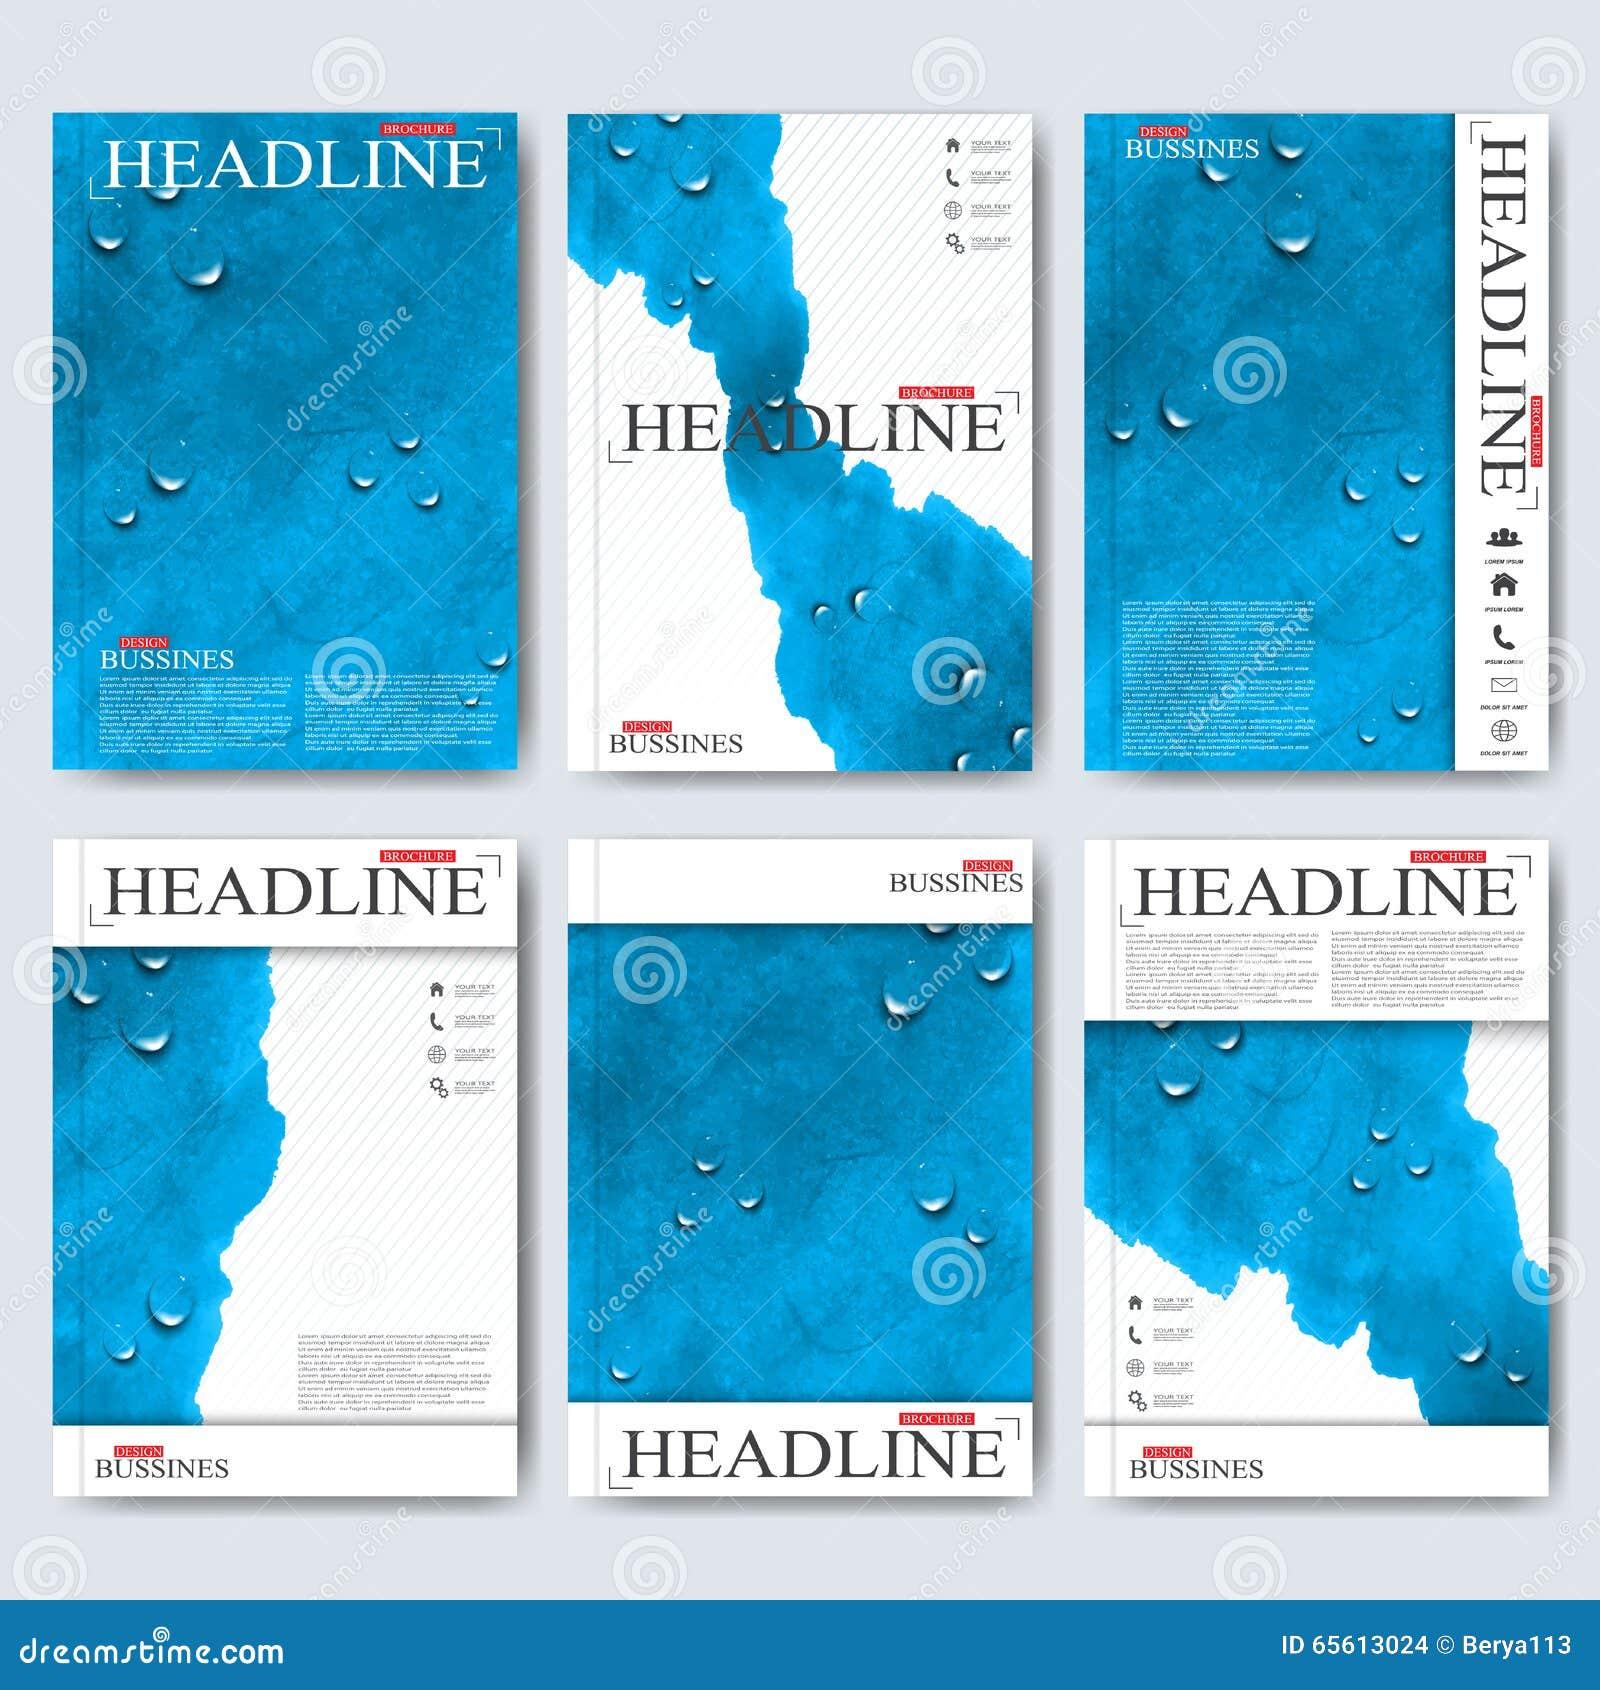 Design Science Journal Cambridge: Modern Vector Templates For Brochure, Flyer, Cover